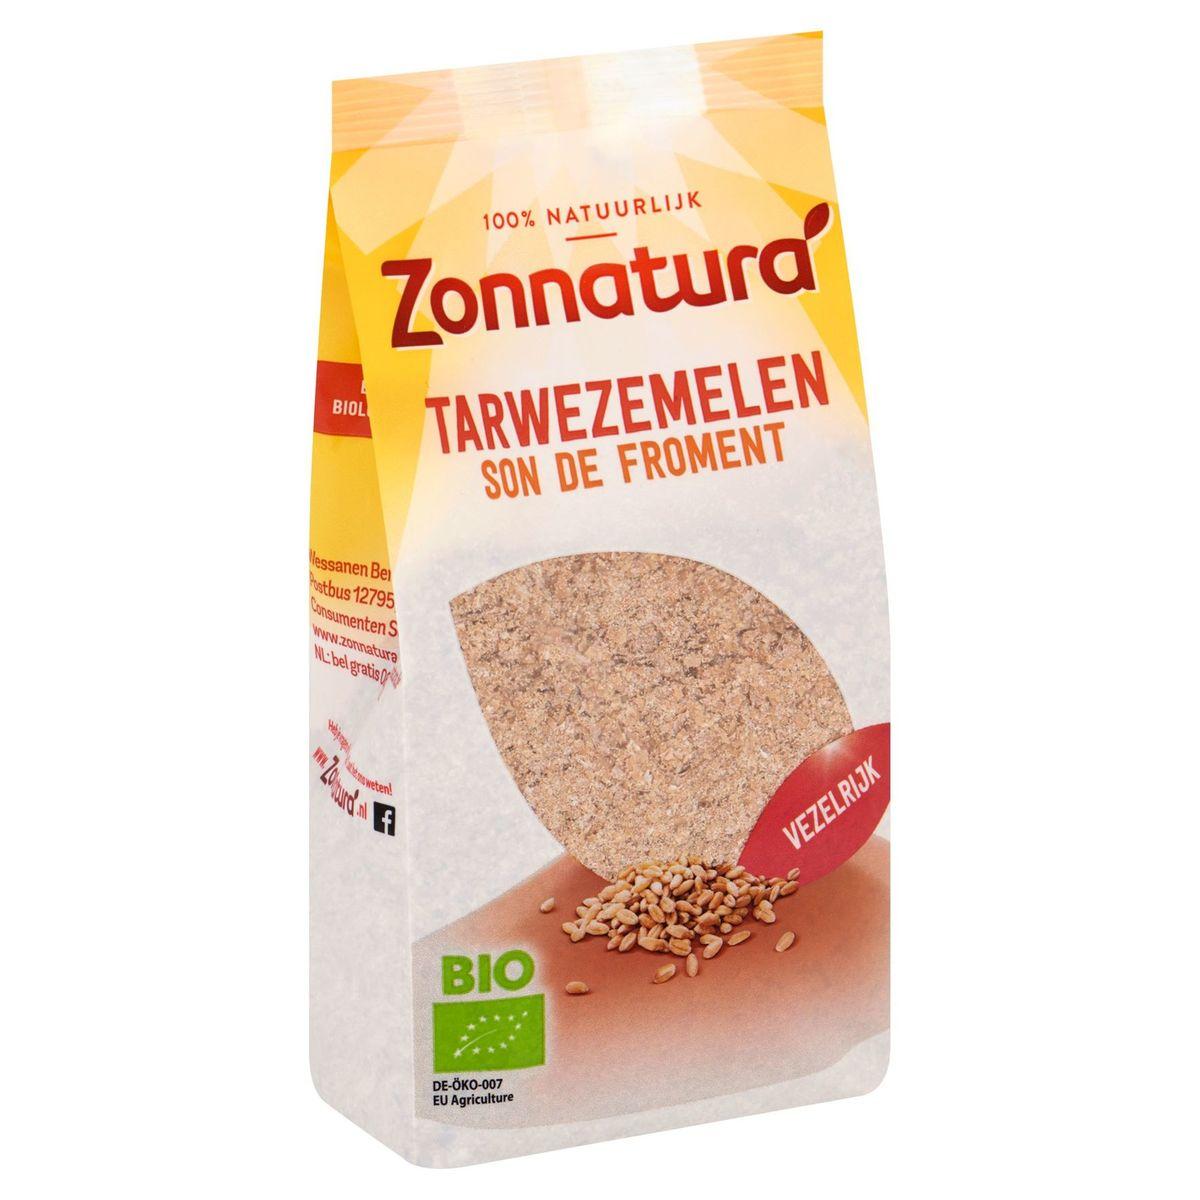 Zonnatura Bio Son de Froment 200 g